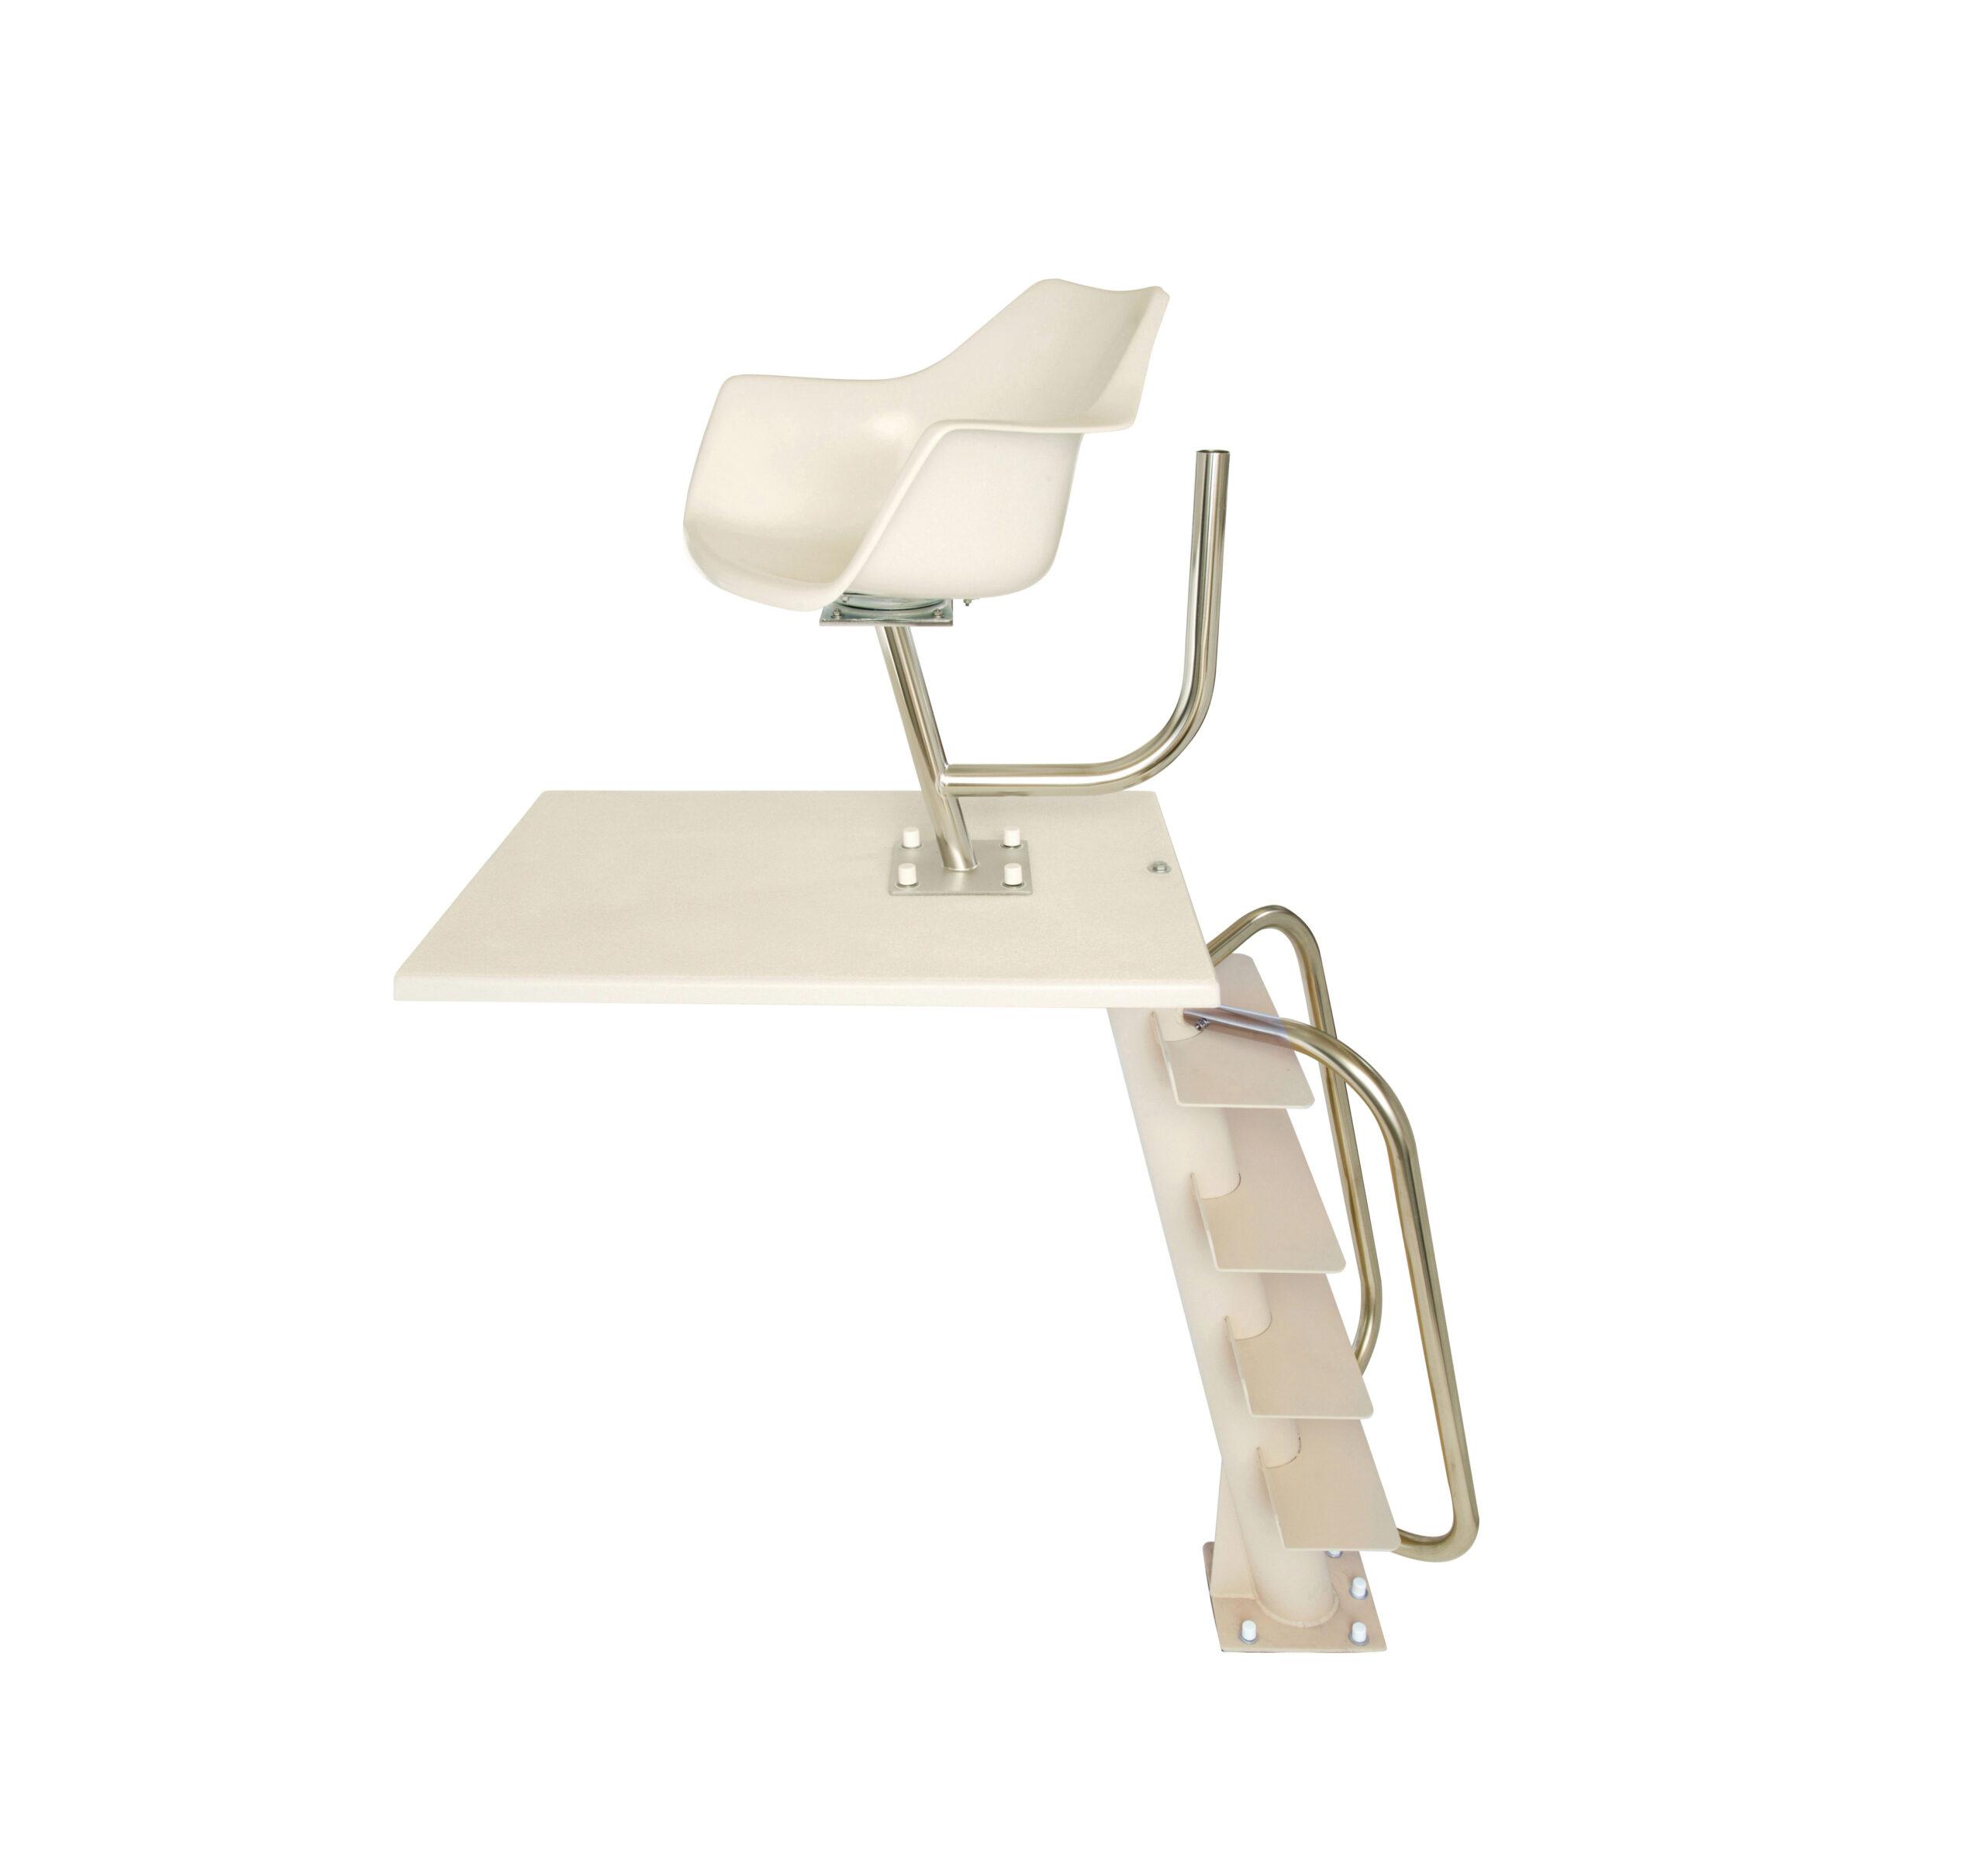 Cantilever Lifeguard Chair